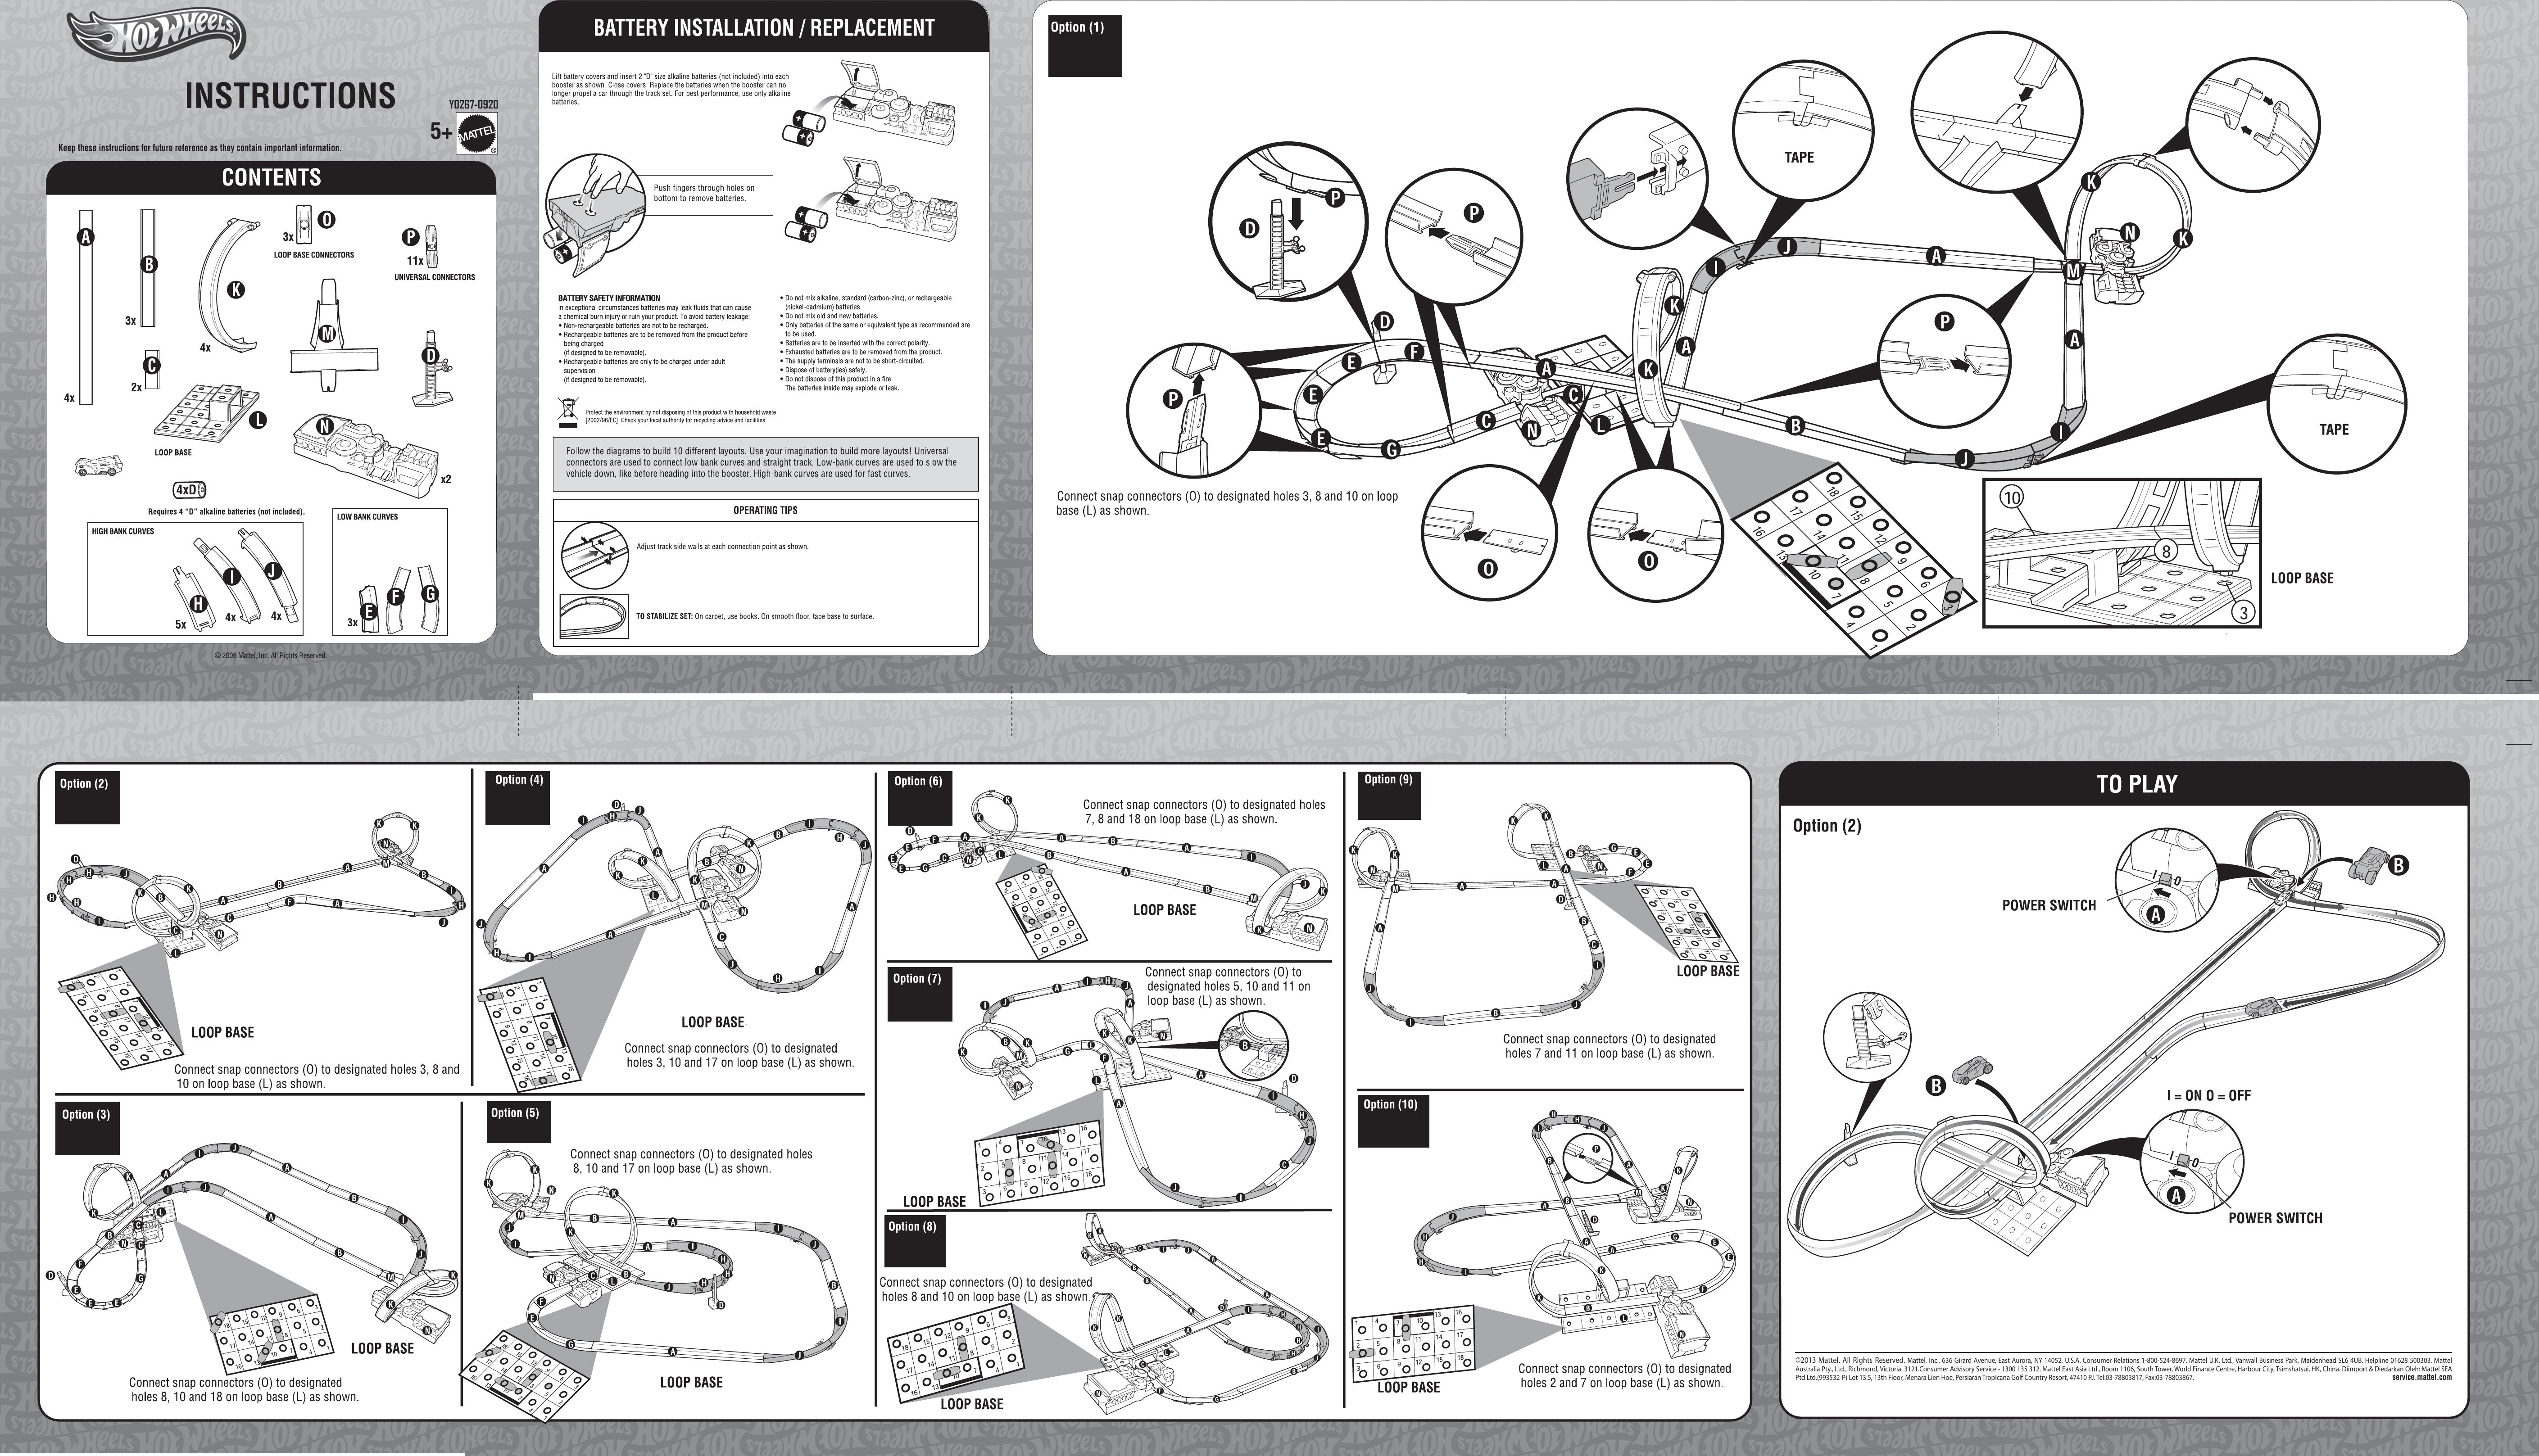 Power Wheels 76819 Manual Guide